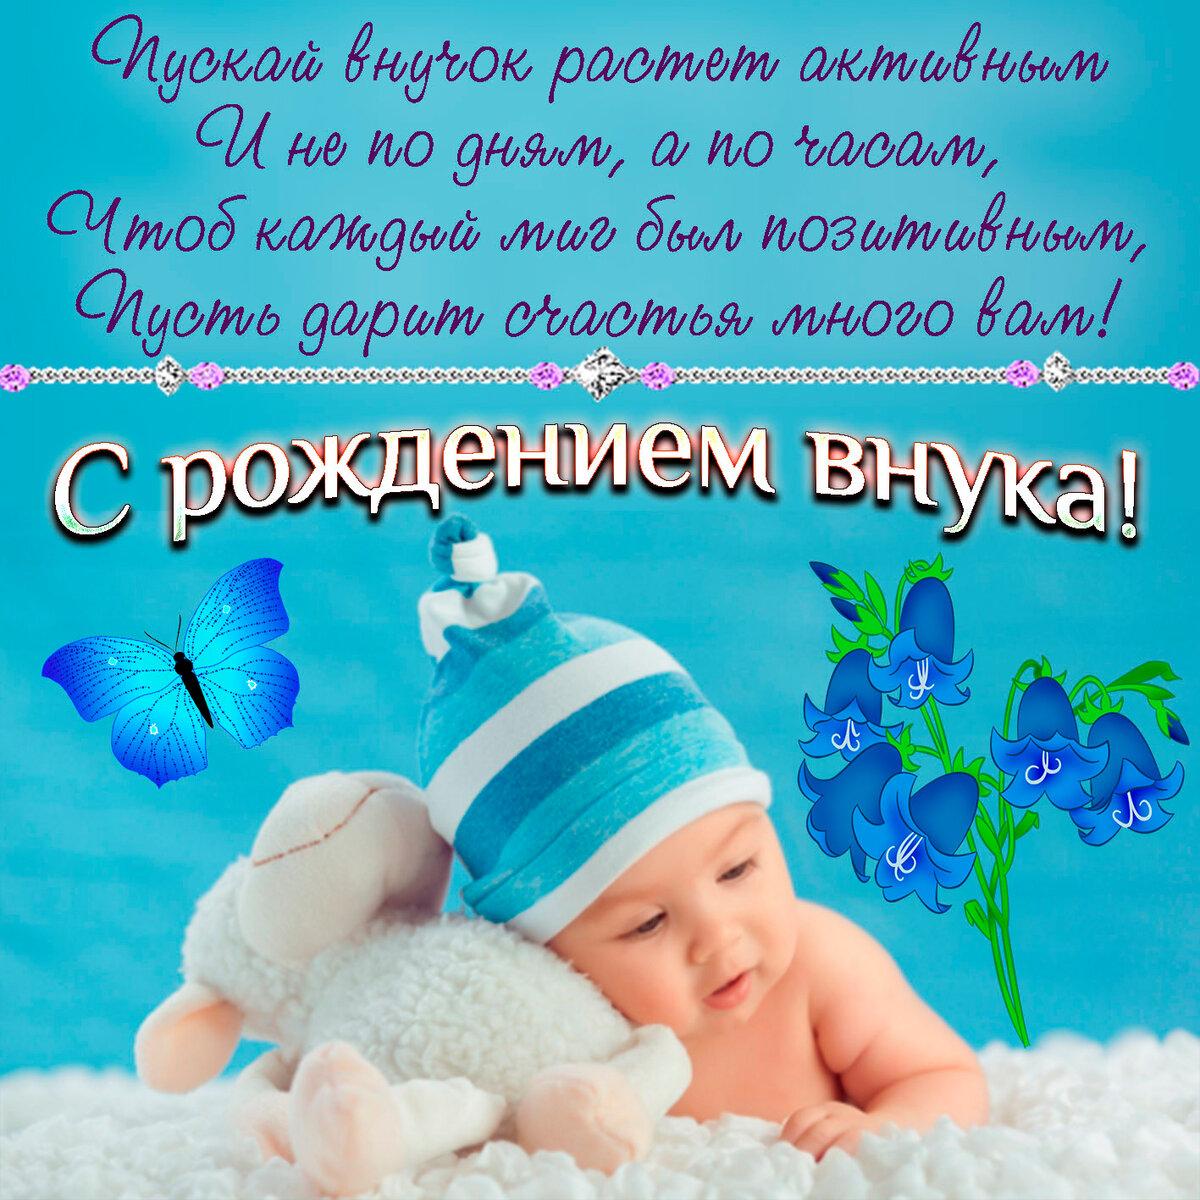 Флеш открытку, картинки младенцем с поздравлениями